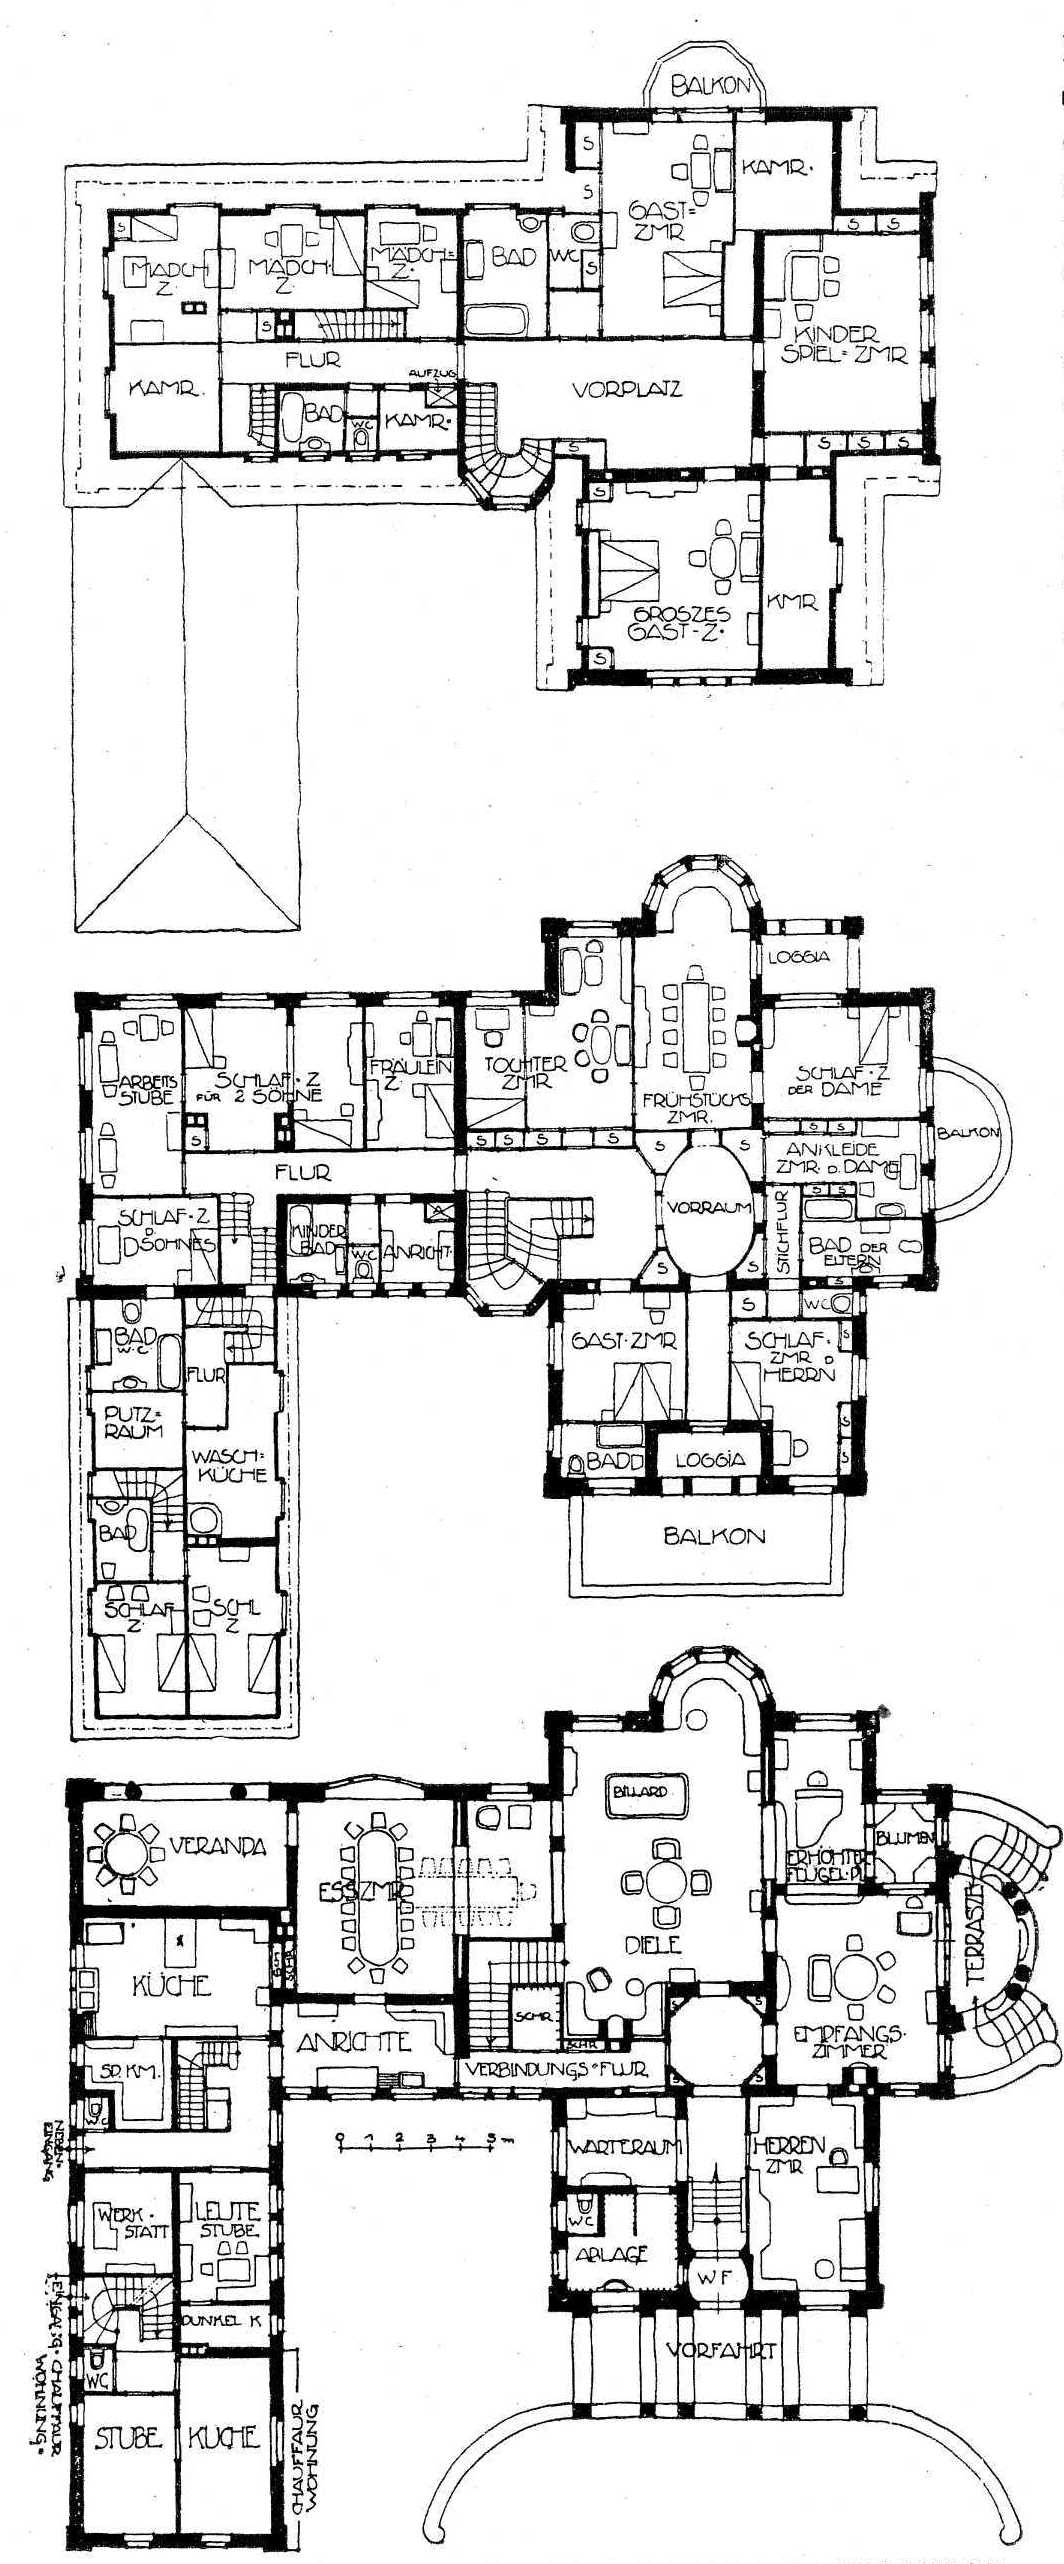 file heilbronn grundriss der villa r melin lerchenstr